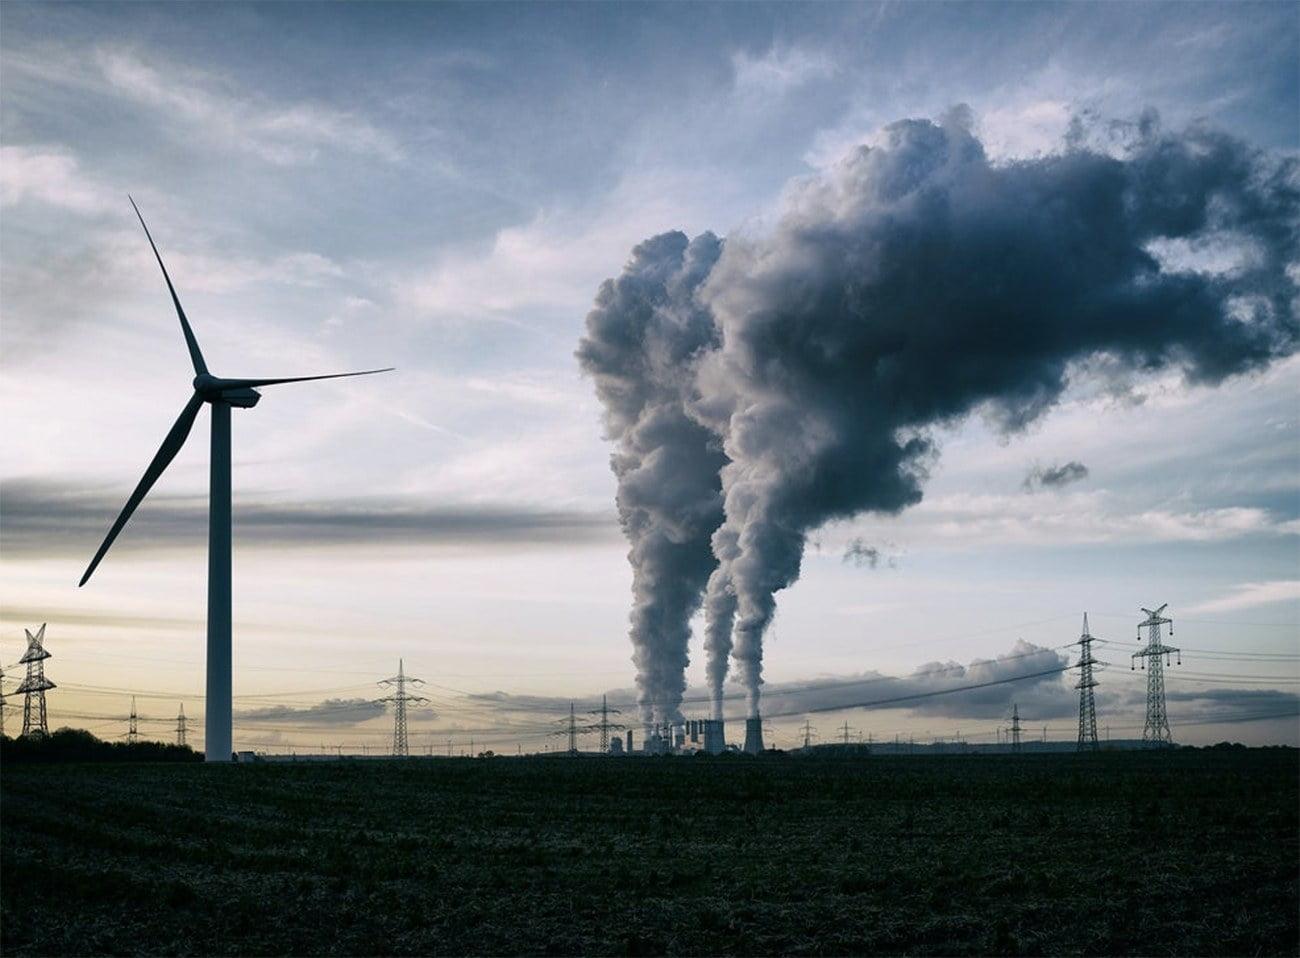 imagem de energia eólica versus queima de combustível fóssil